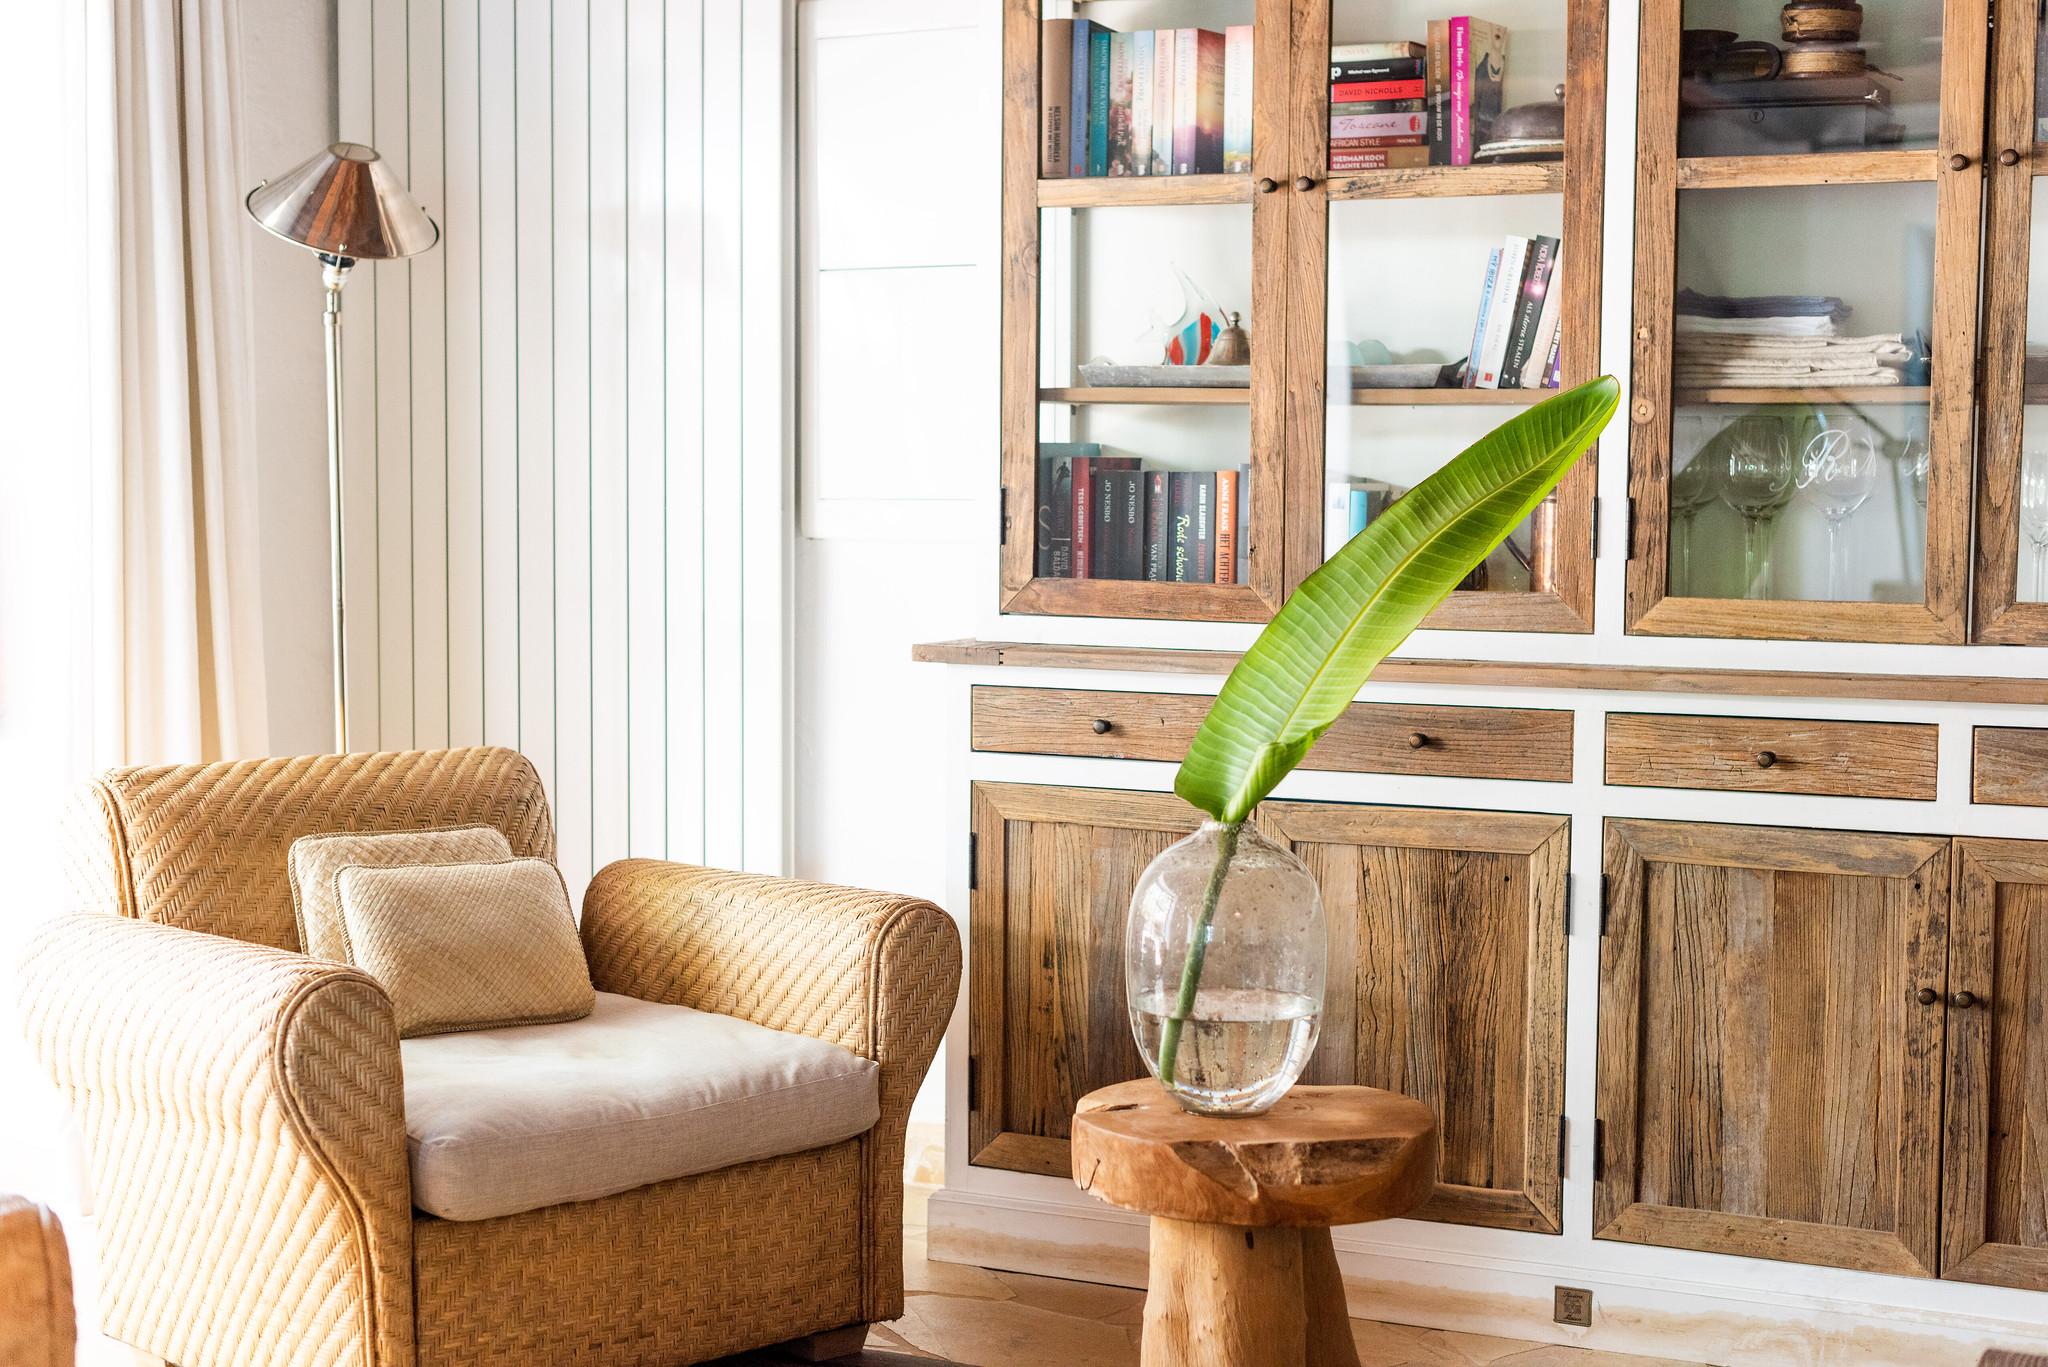 https://www.white-ibiza.com/wp-content/uploads/2020/05/white-ibiza-villas-can-riviere-interior-rattan-armchair.jpg